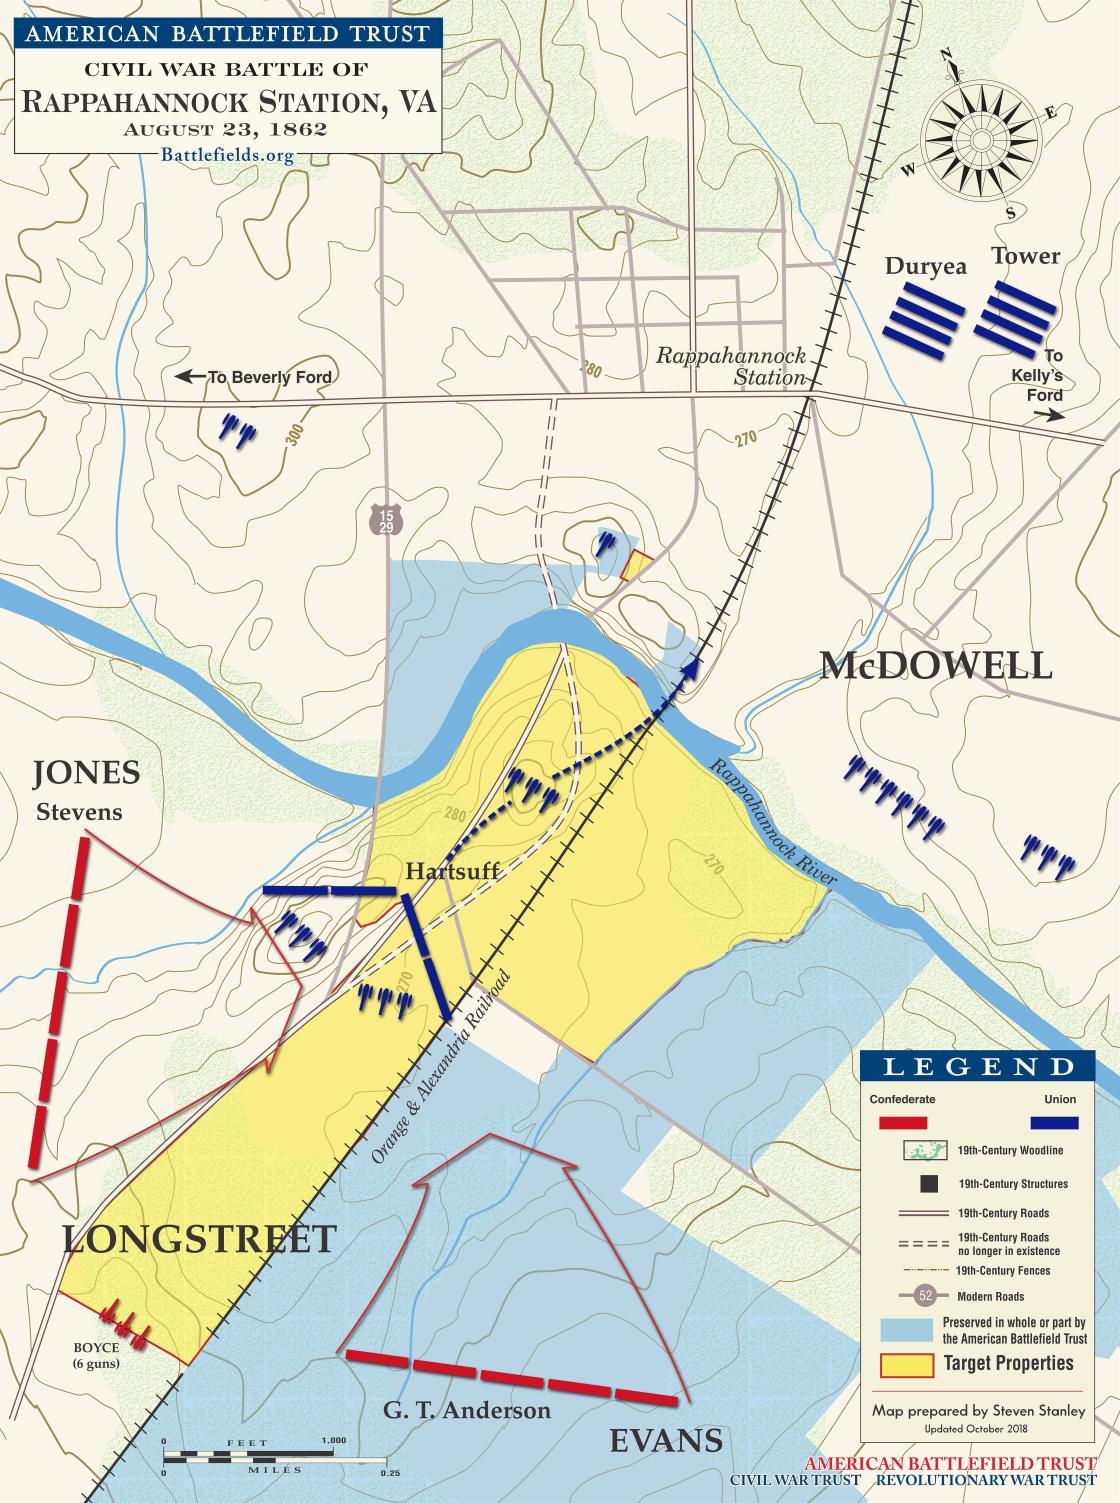 Battle of Rappahannock Station - August 22-25, 1862 | American ...